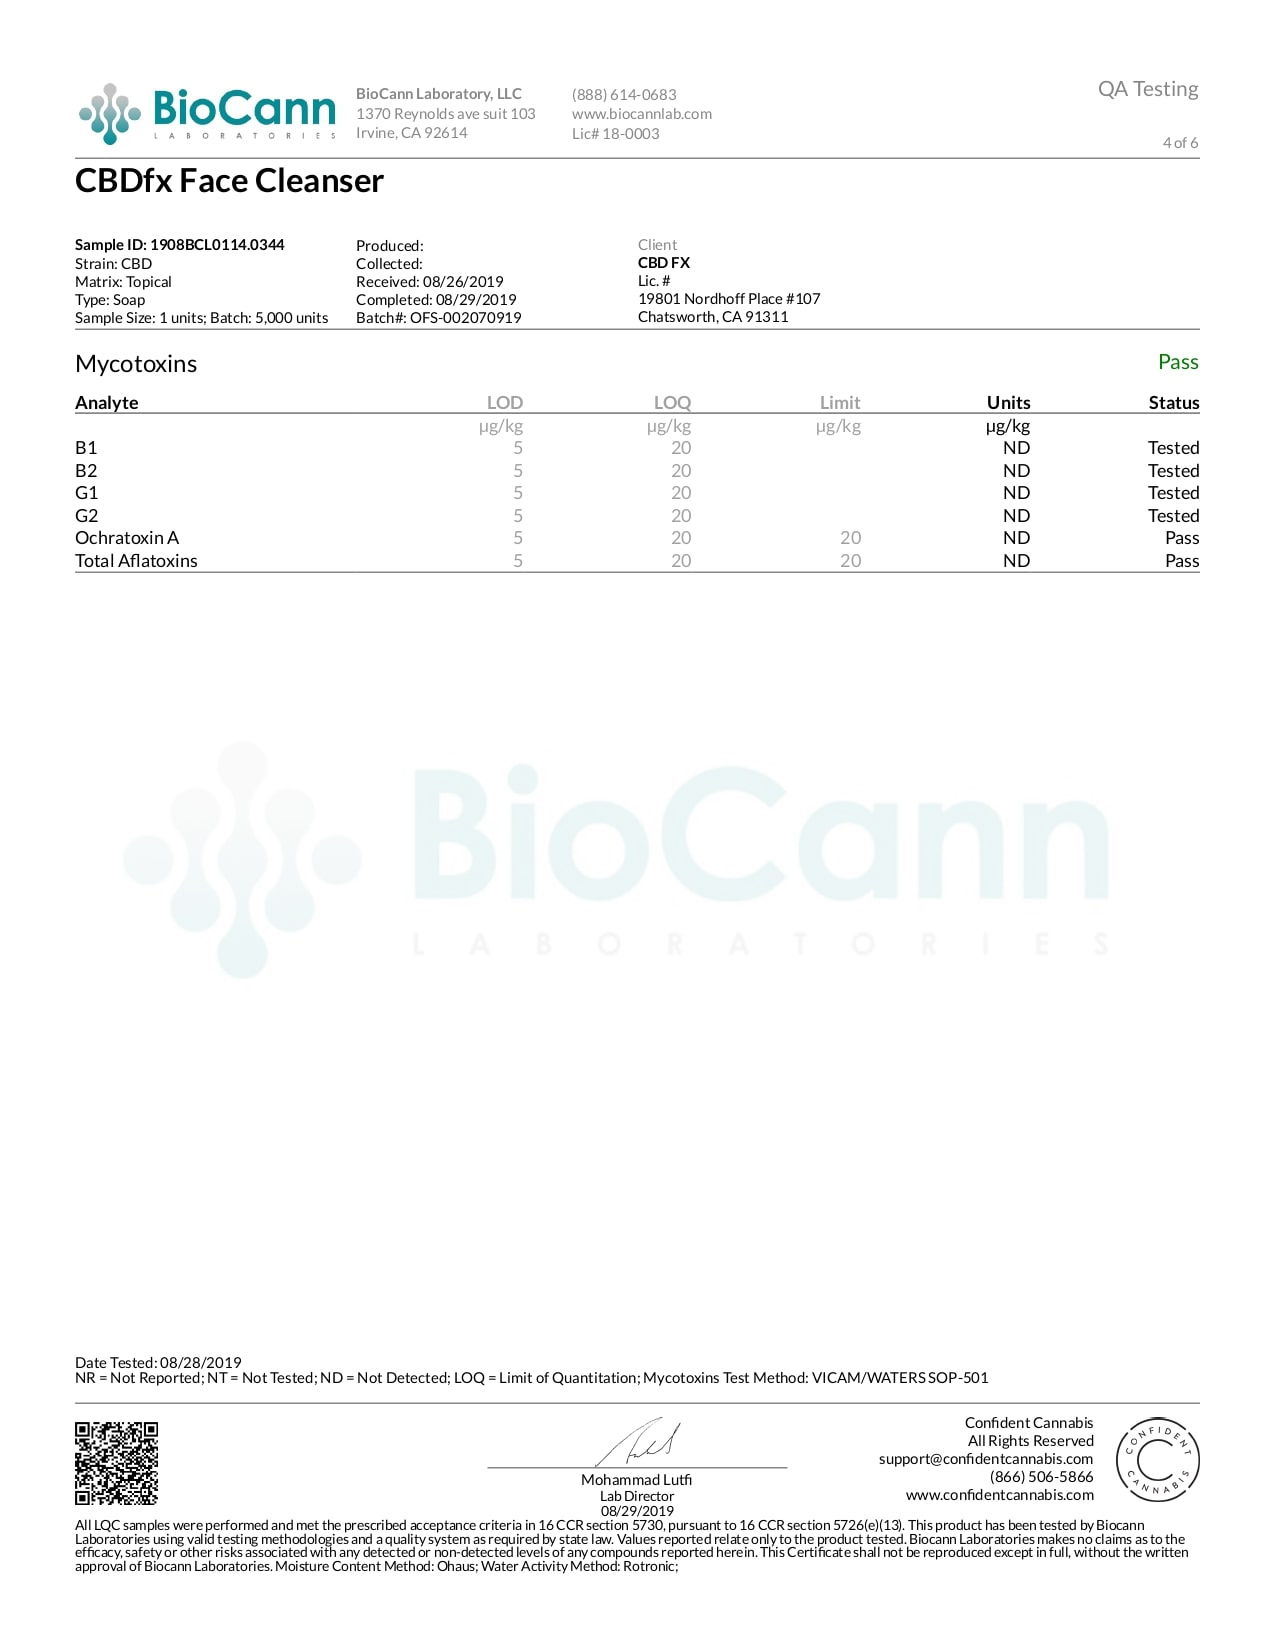 CBDfx CBD Face Cleanser Rejuvediol Lab Report Broad Spectrum 50mg